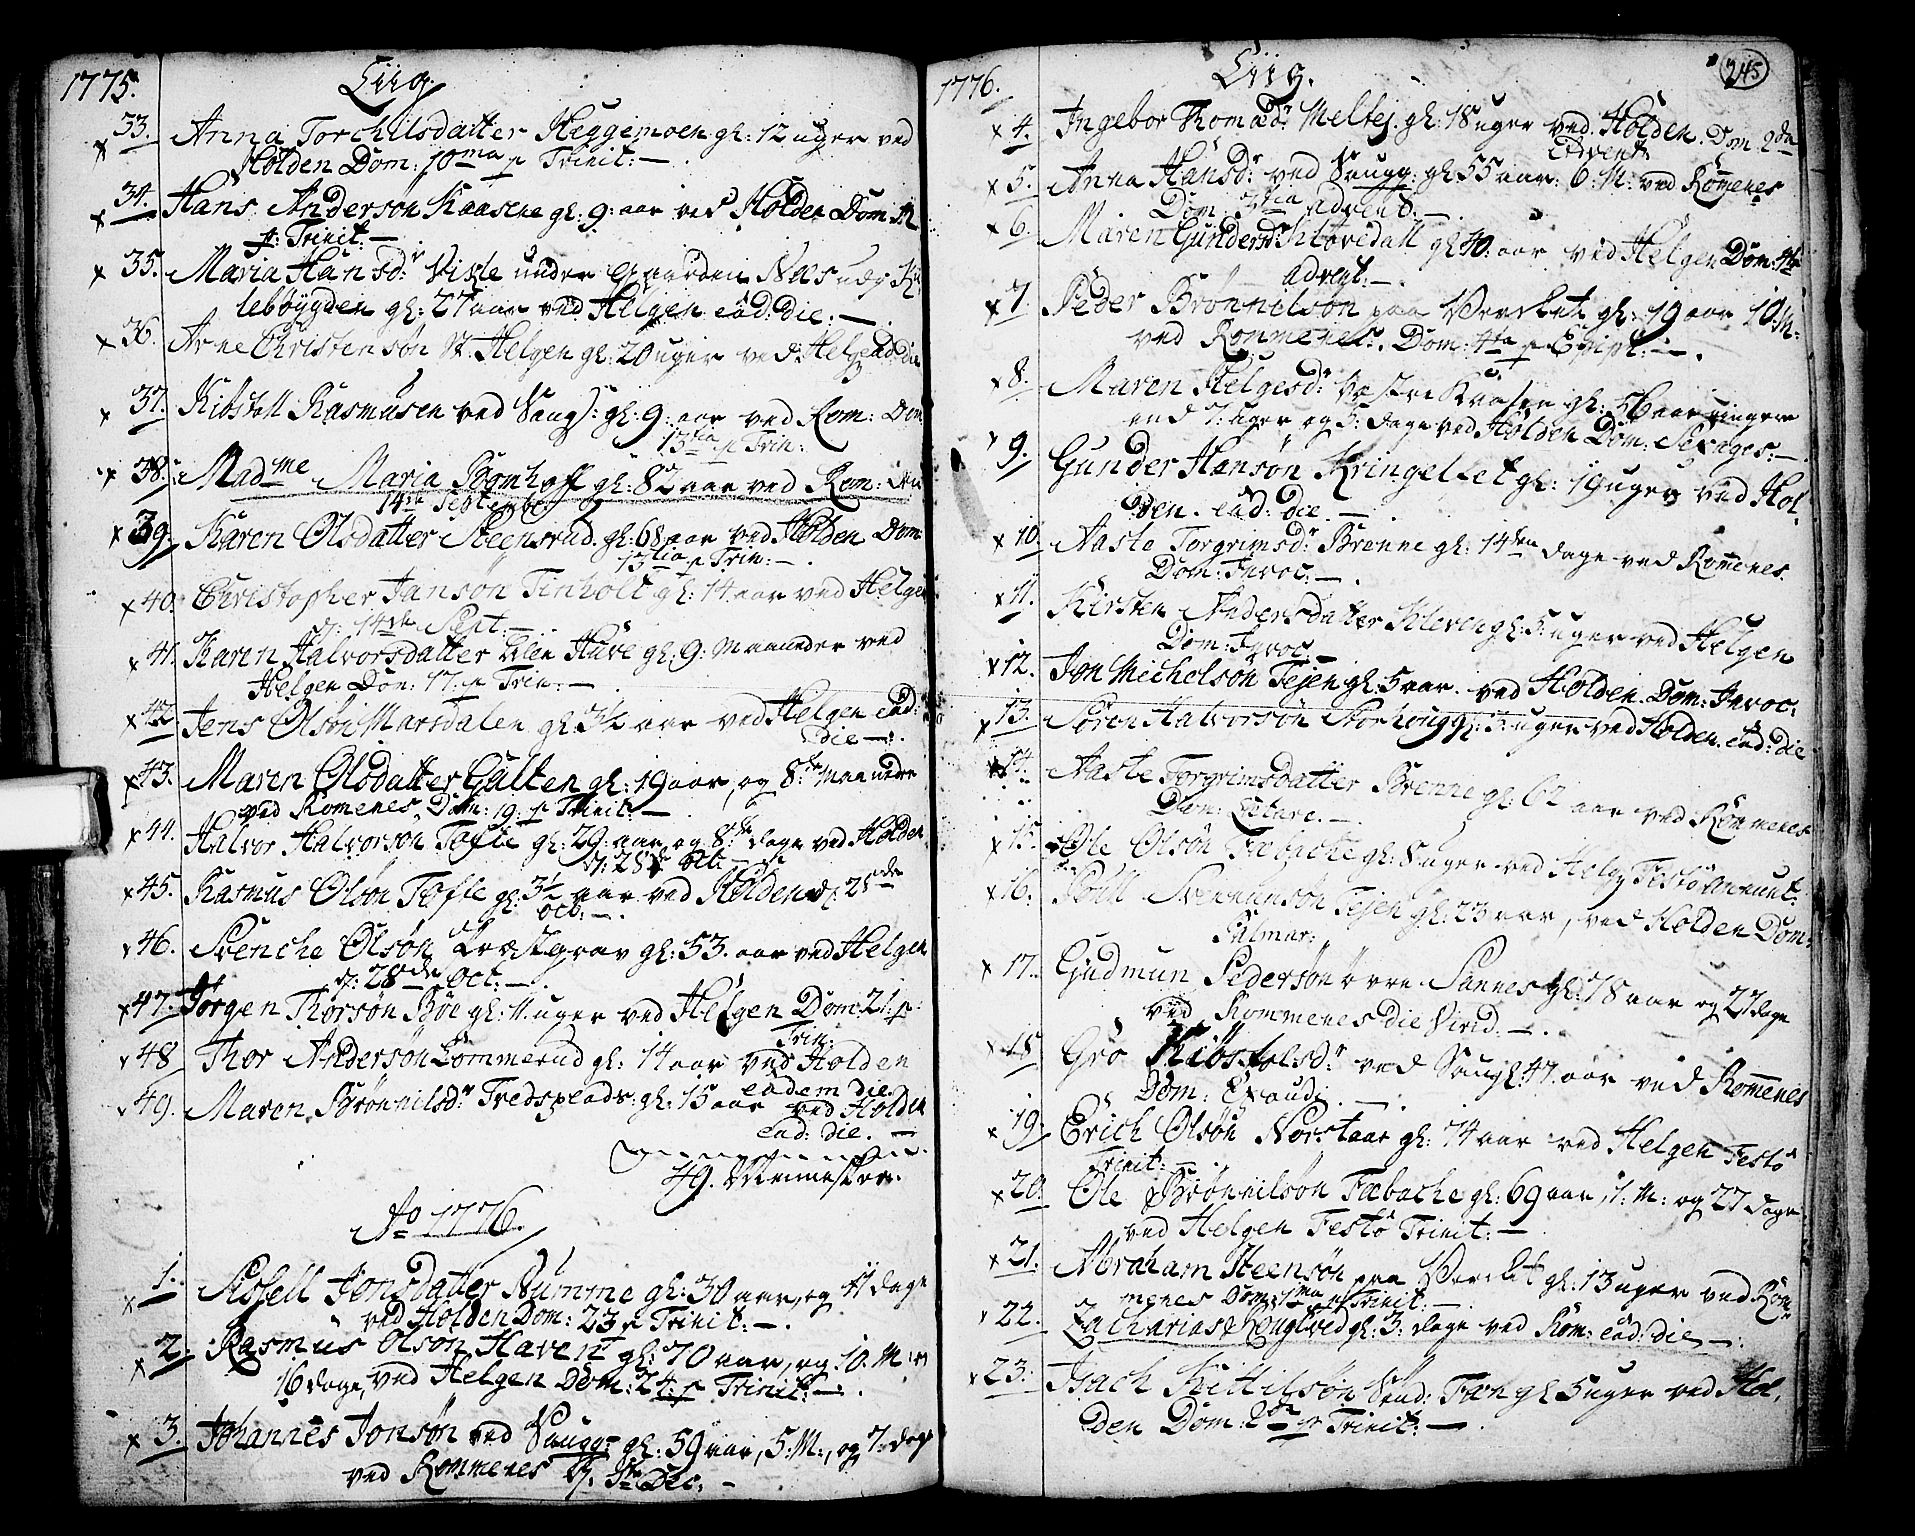 SAKO, Holla kirkebøker, F/Fa/L0001: Ministerialbok nr. 1, 1717-1779, s. 245